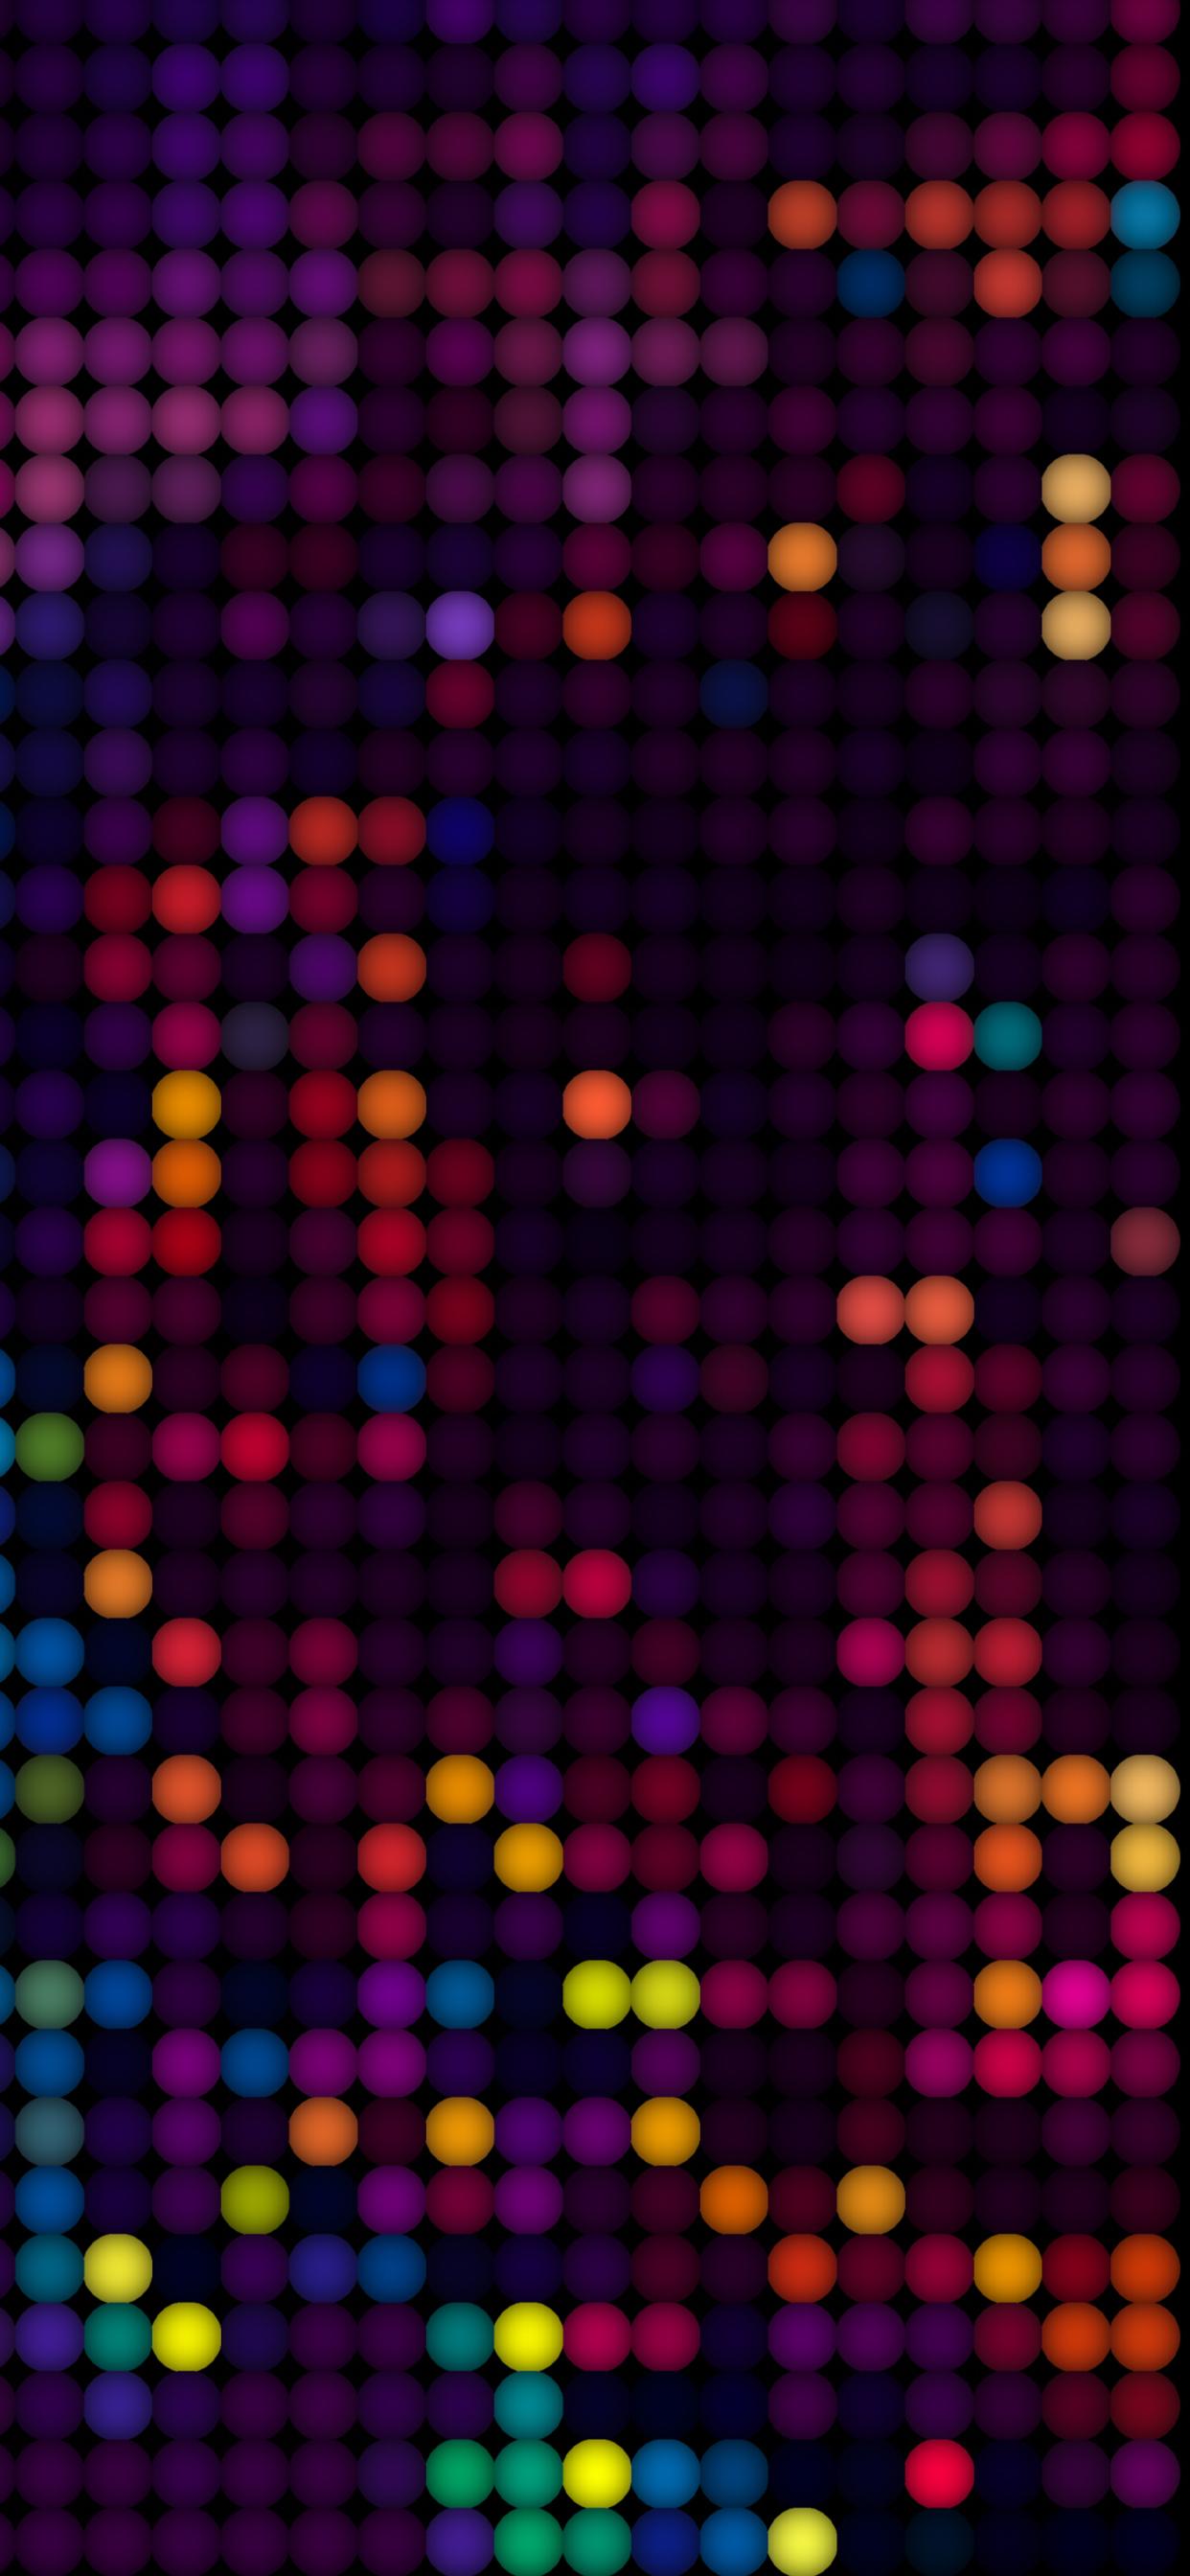 balls-abstract-4k-hw.jpg